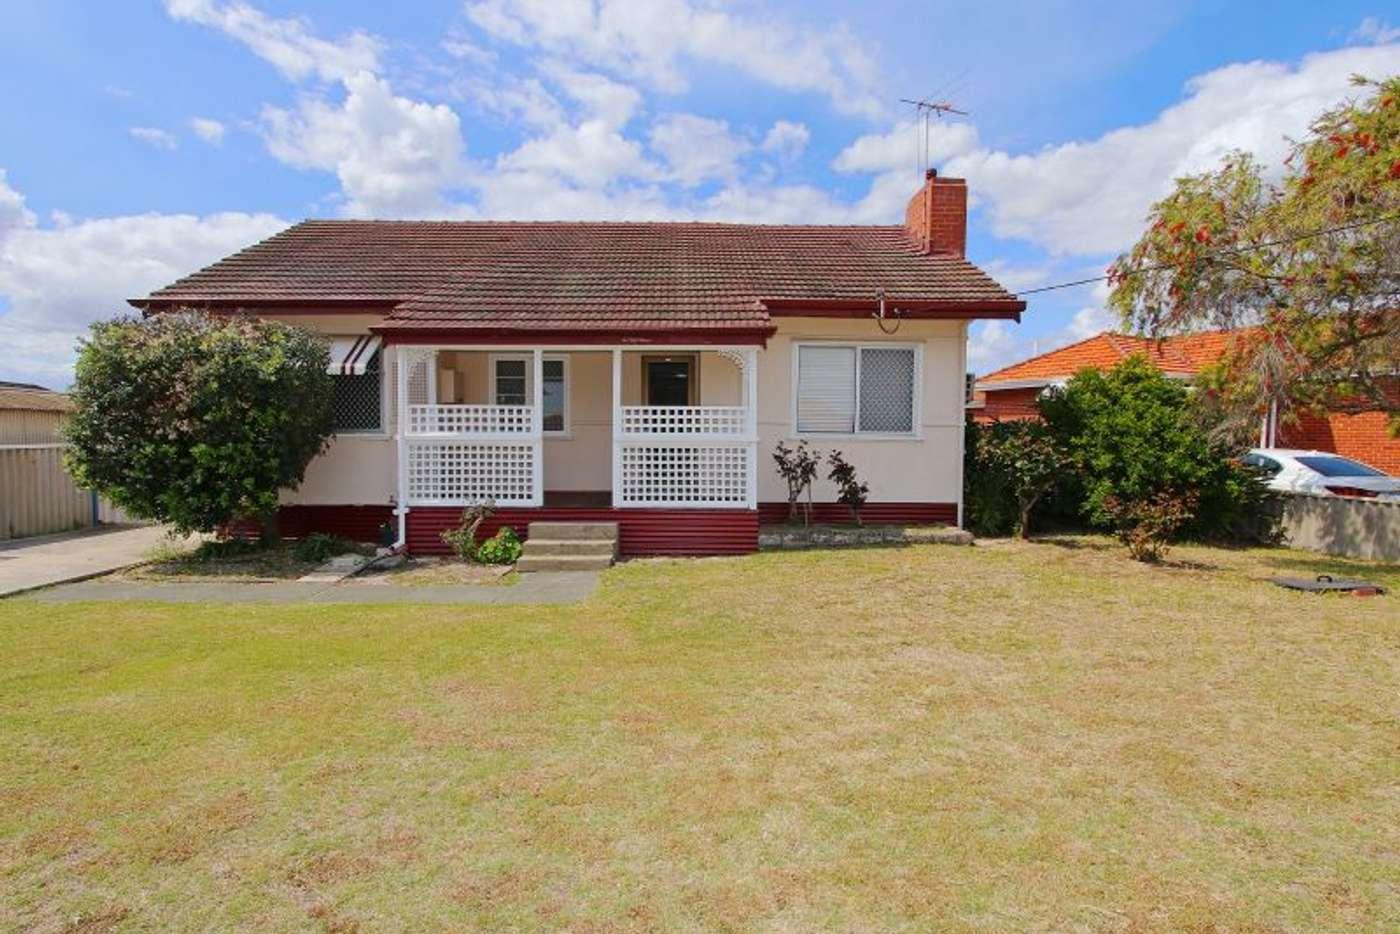 Main view of Homely house listing, 1 Harman Street, Belmont WA 6104